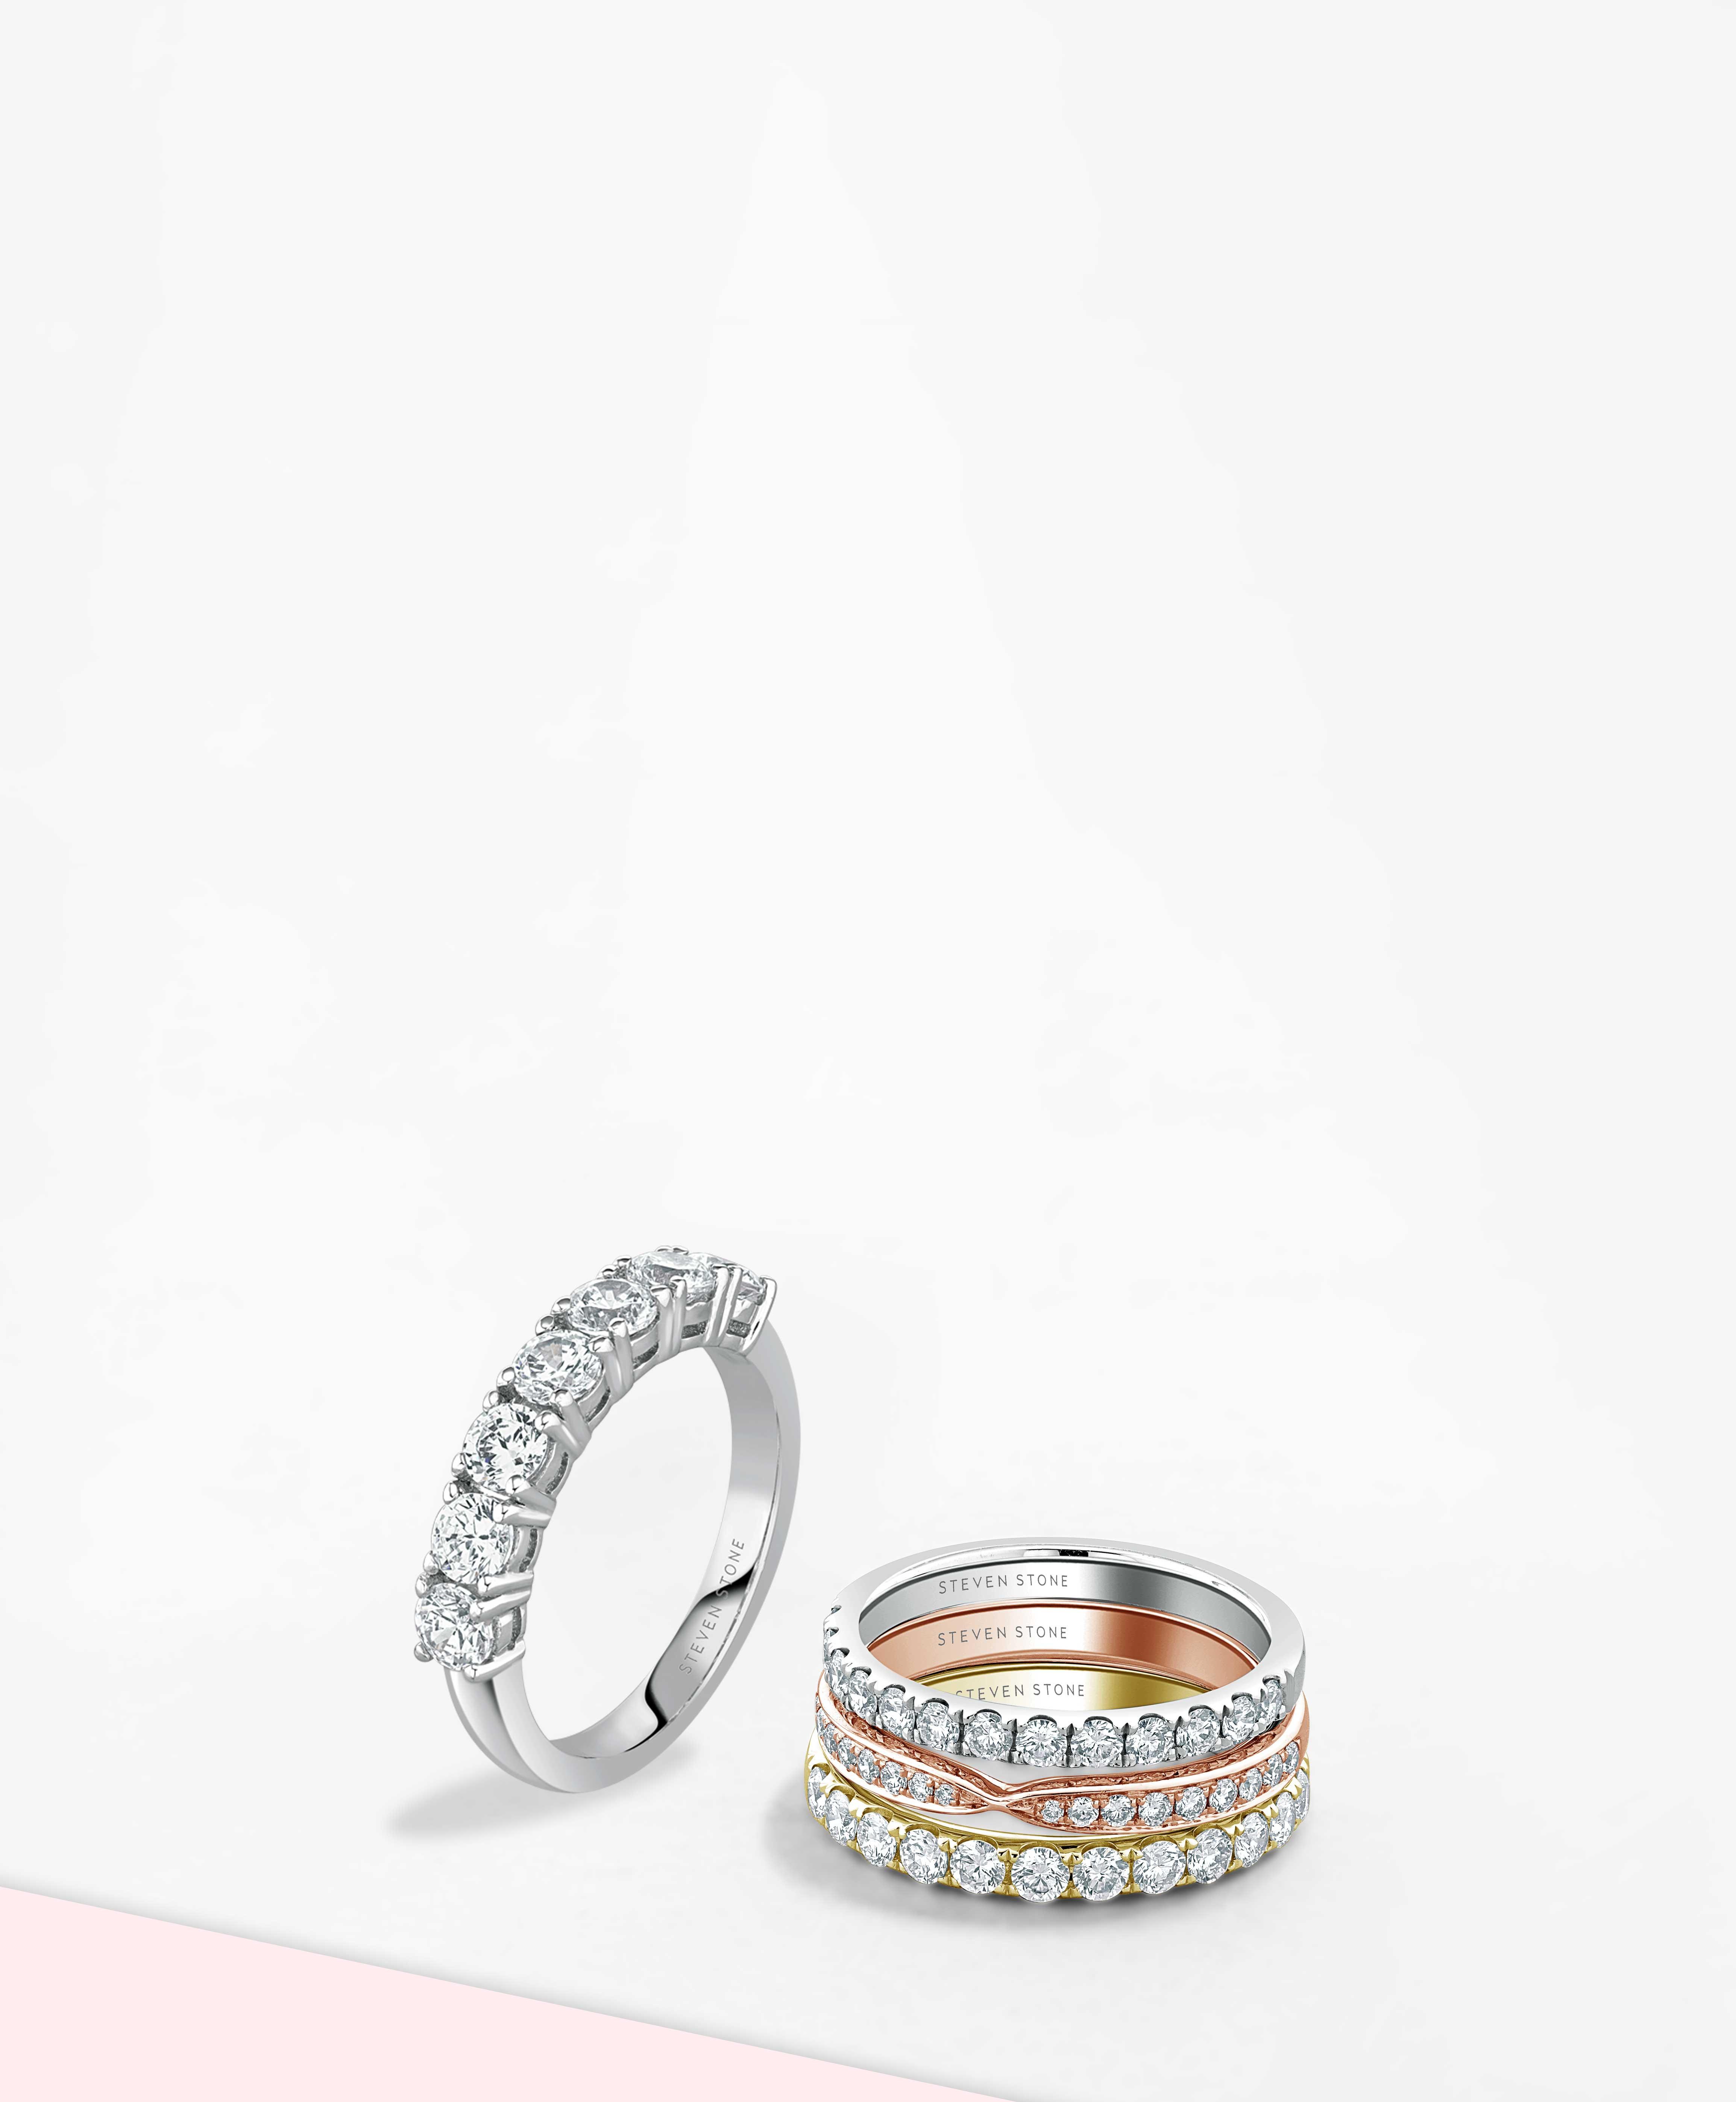 Platinum 3 / 4 Set Eternity Rings